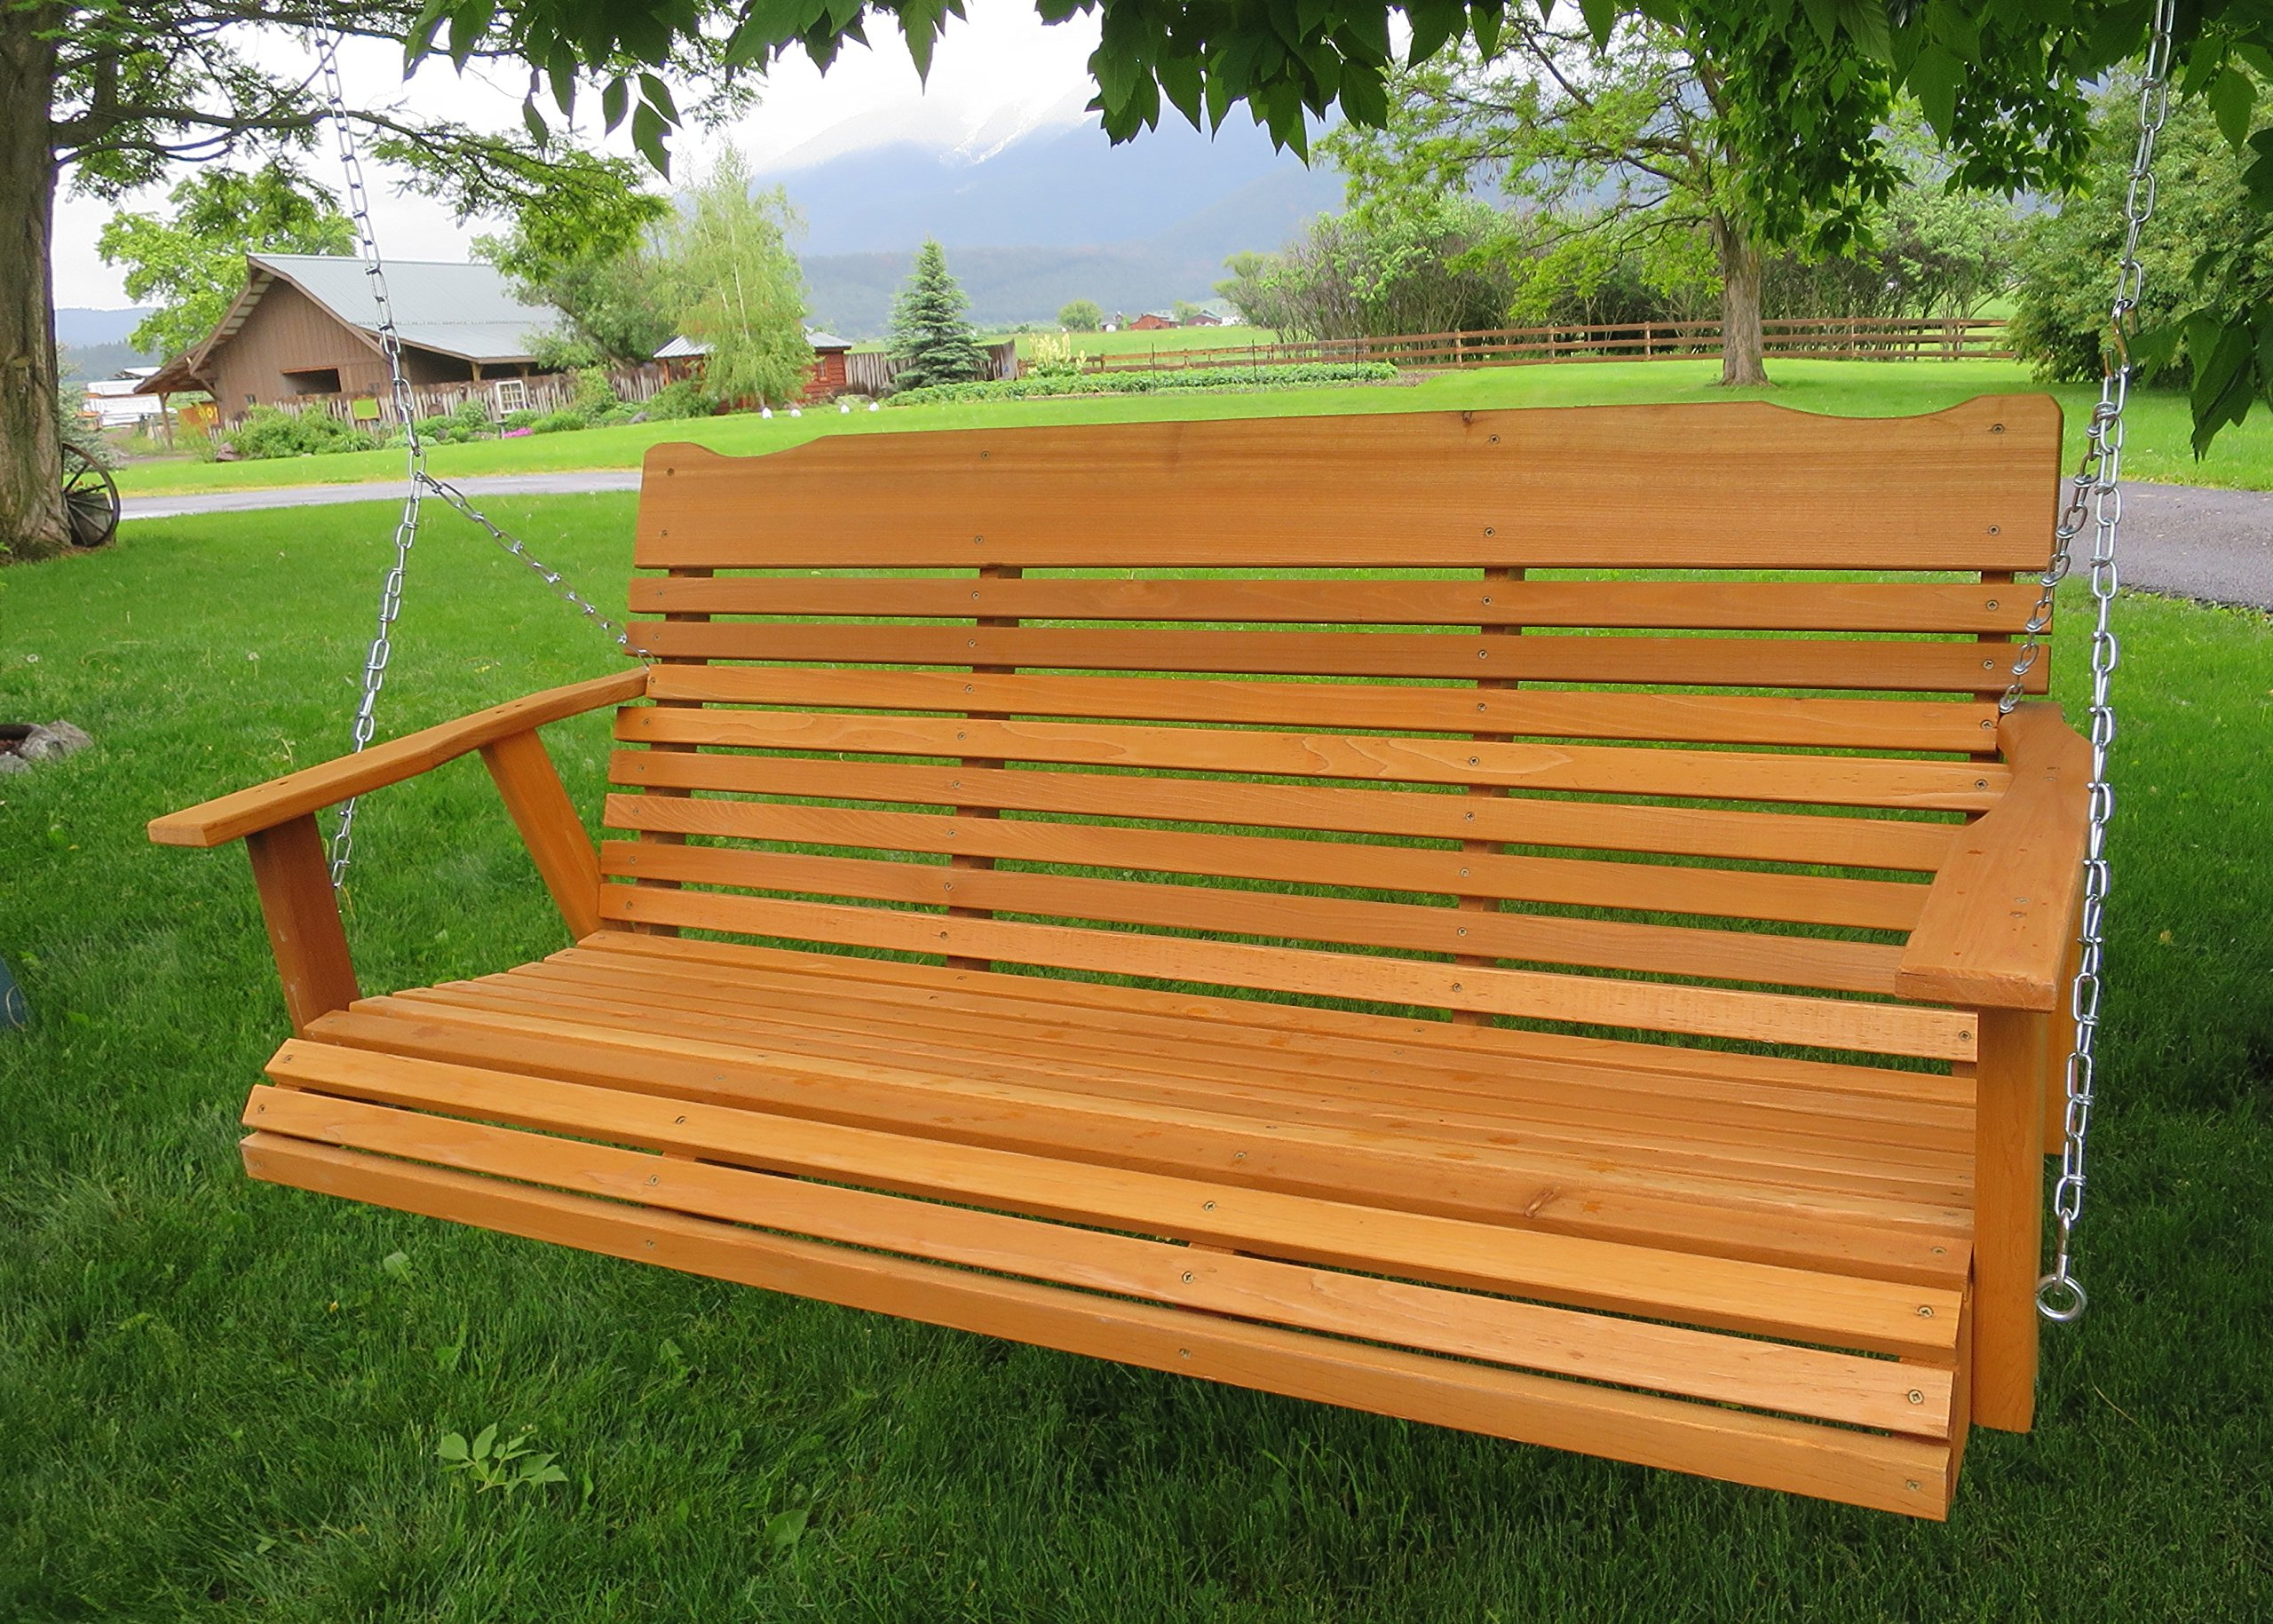 Most Popular A4 Ft Cedar Pergola Swings In Cheap Cedar Swing Sets, Find Cedar Swing Sets Deals On Line (View 10 of 25)